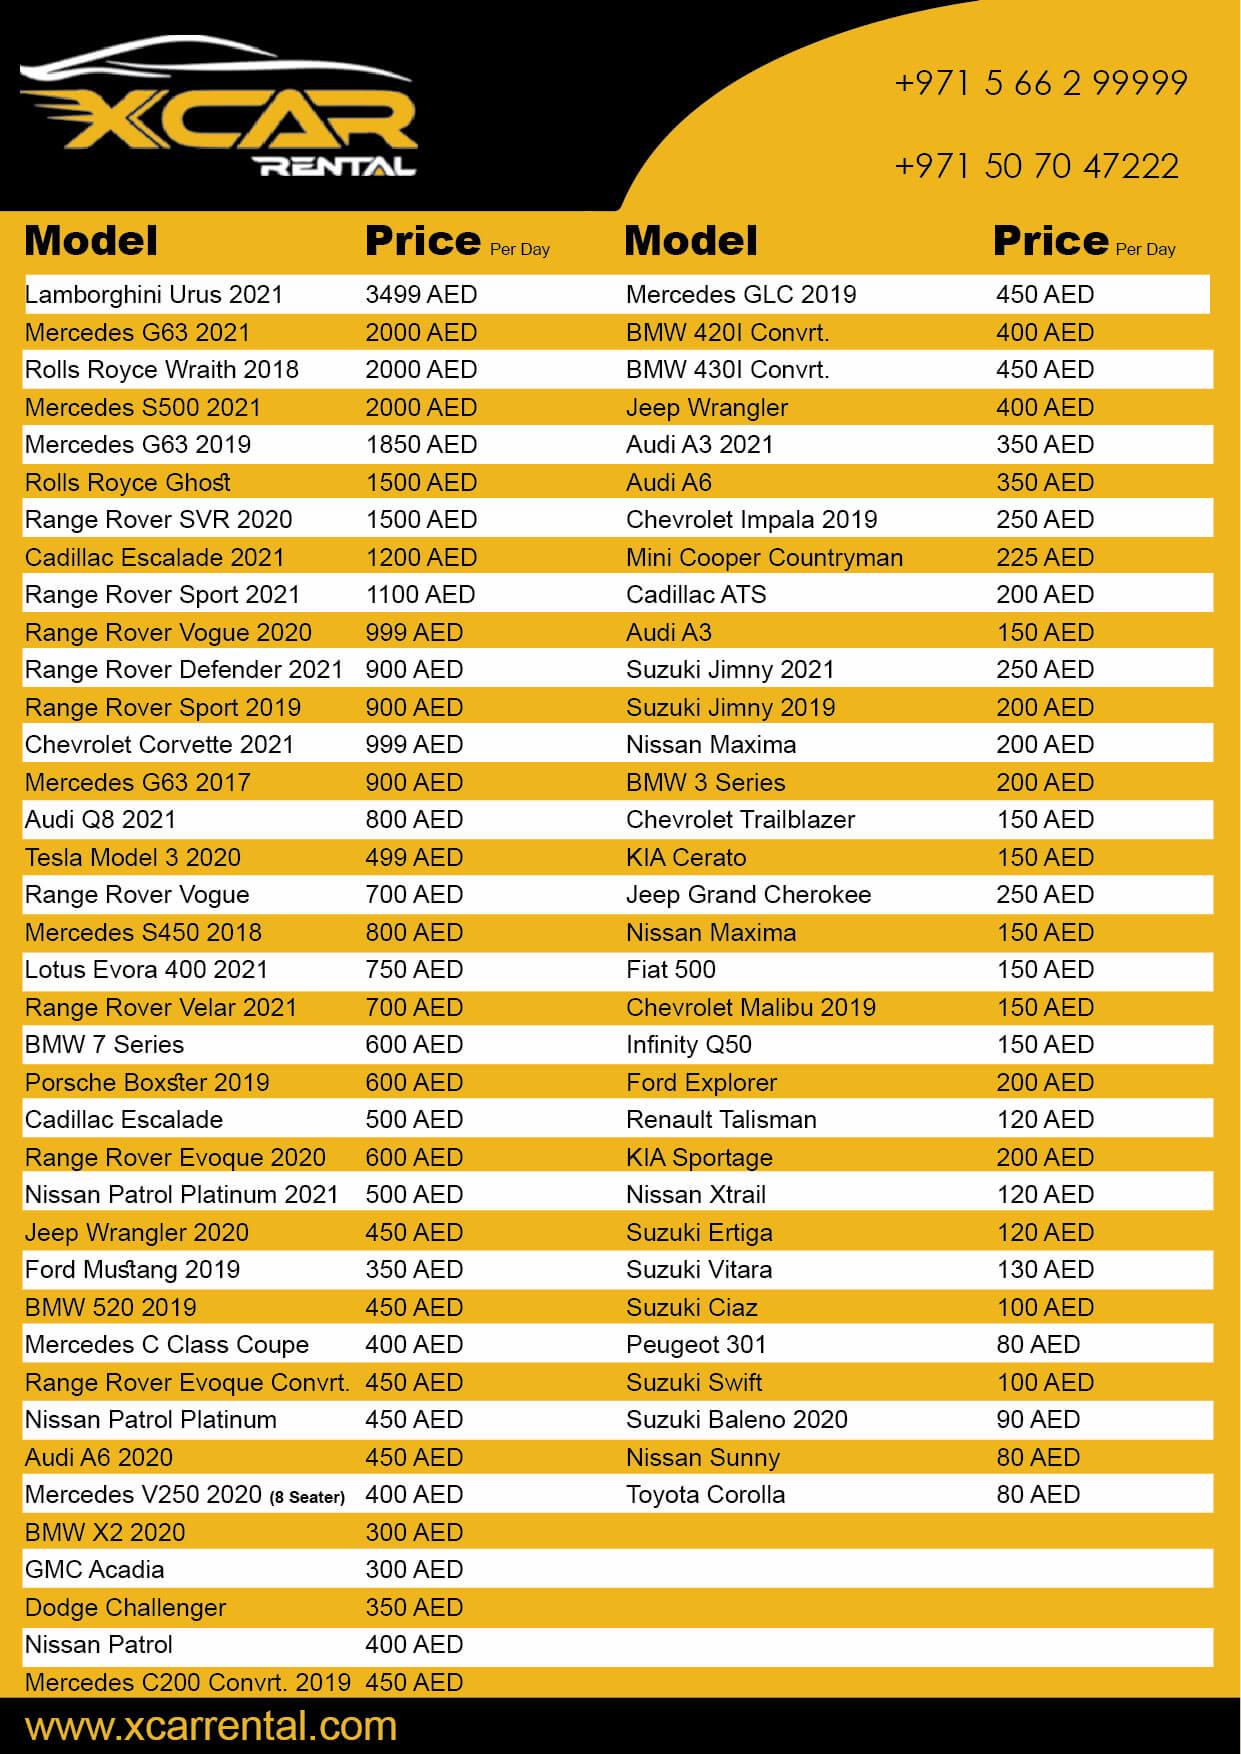 Sports and Luxury Car Rental Price List in Dubai